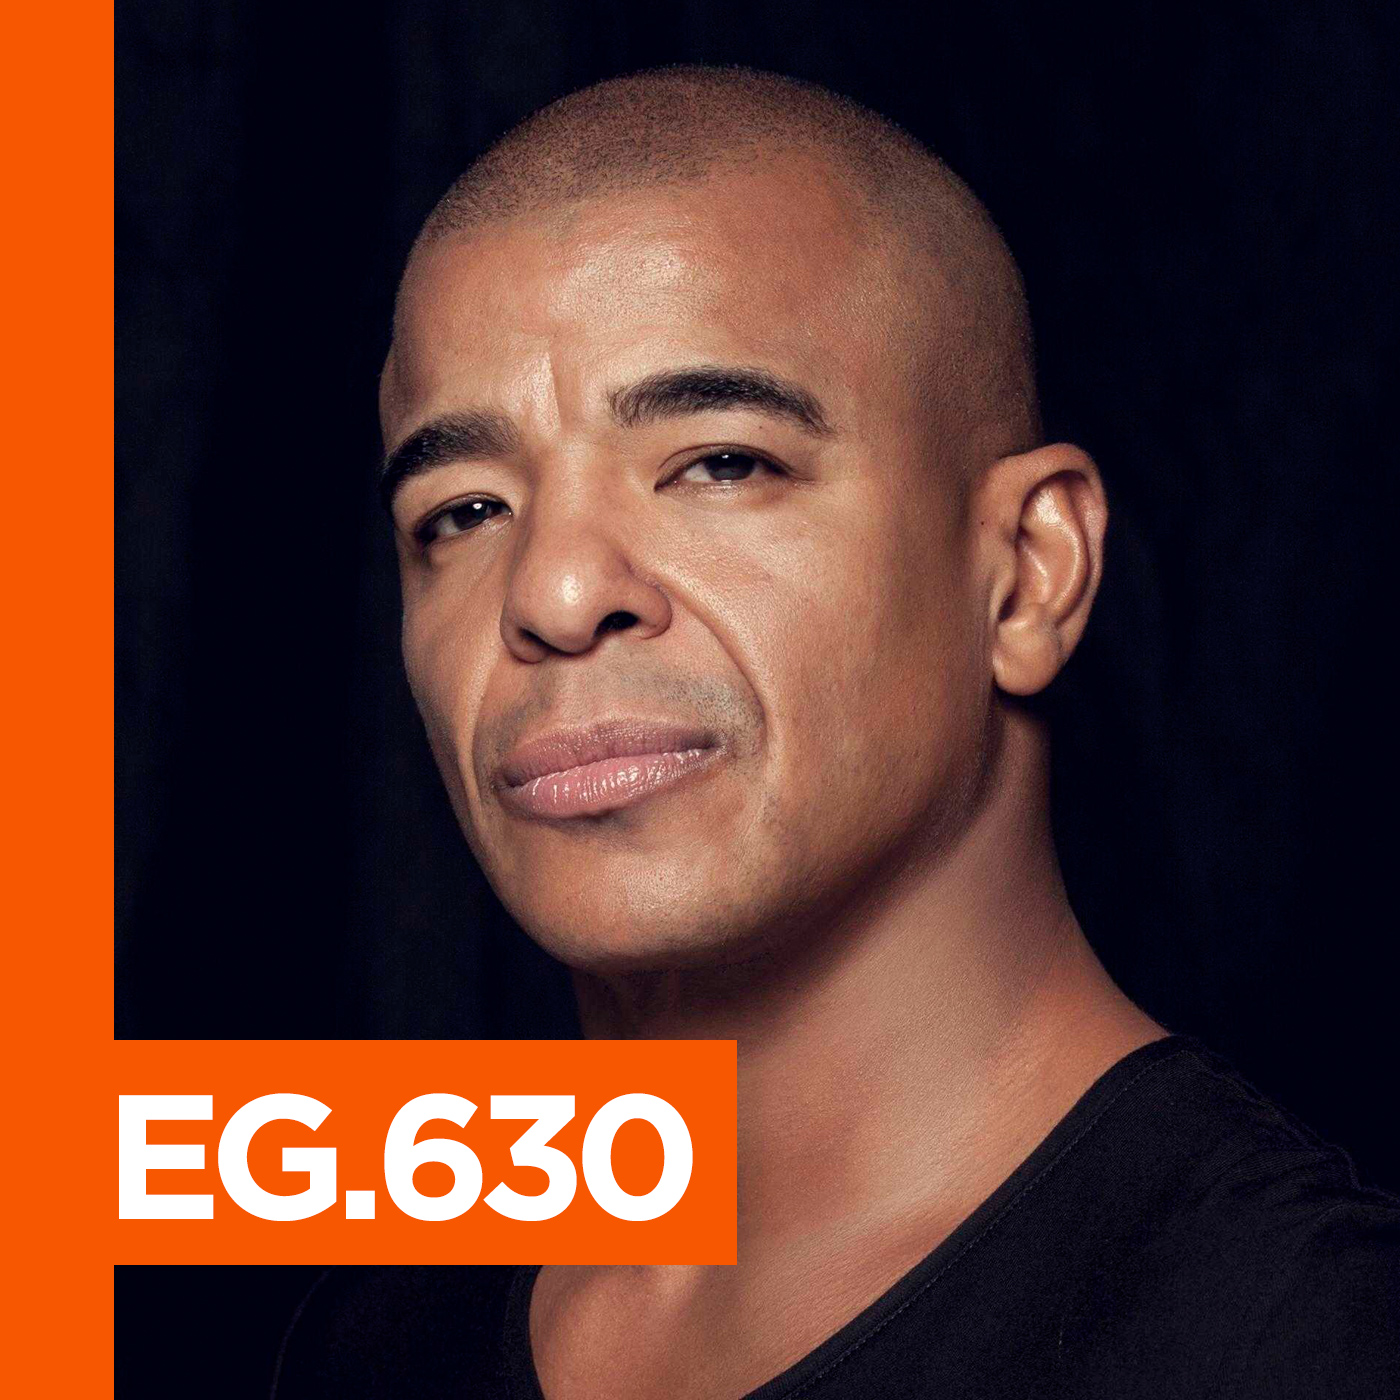 EG.630 Erick Morillo